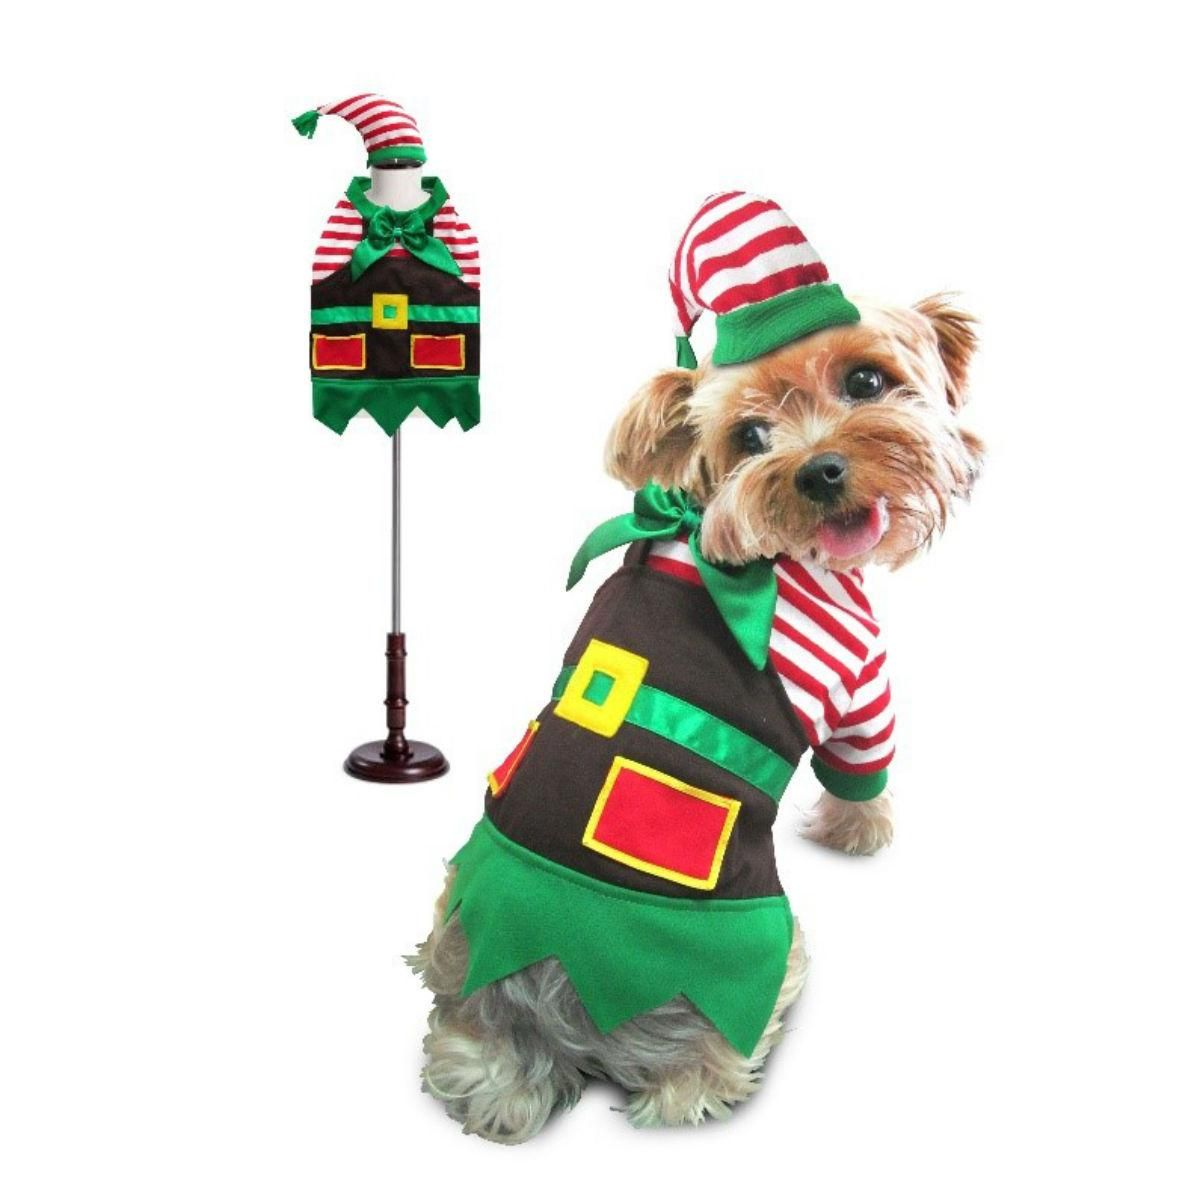 Santa S Elf Dog Costume Pet Costumes Christmas Dog Dog Costumes